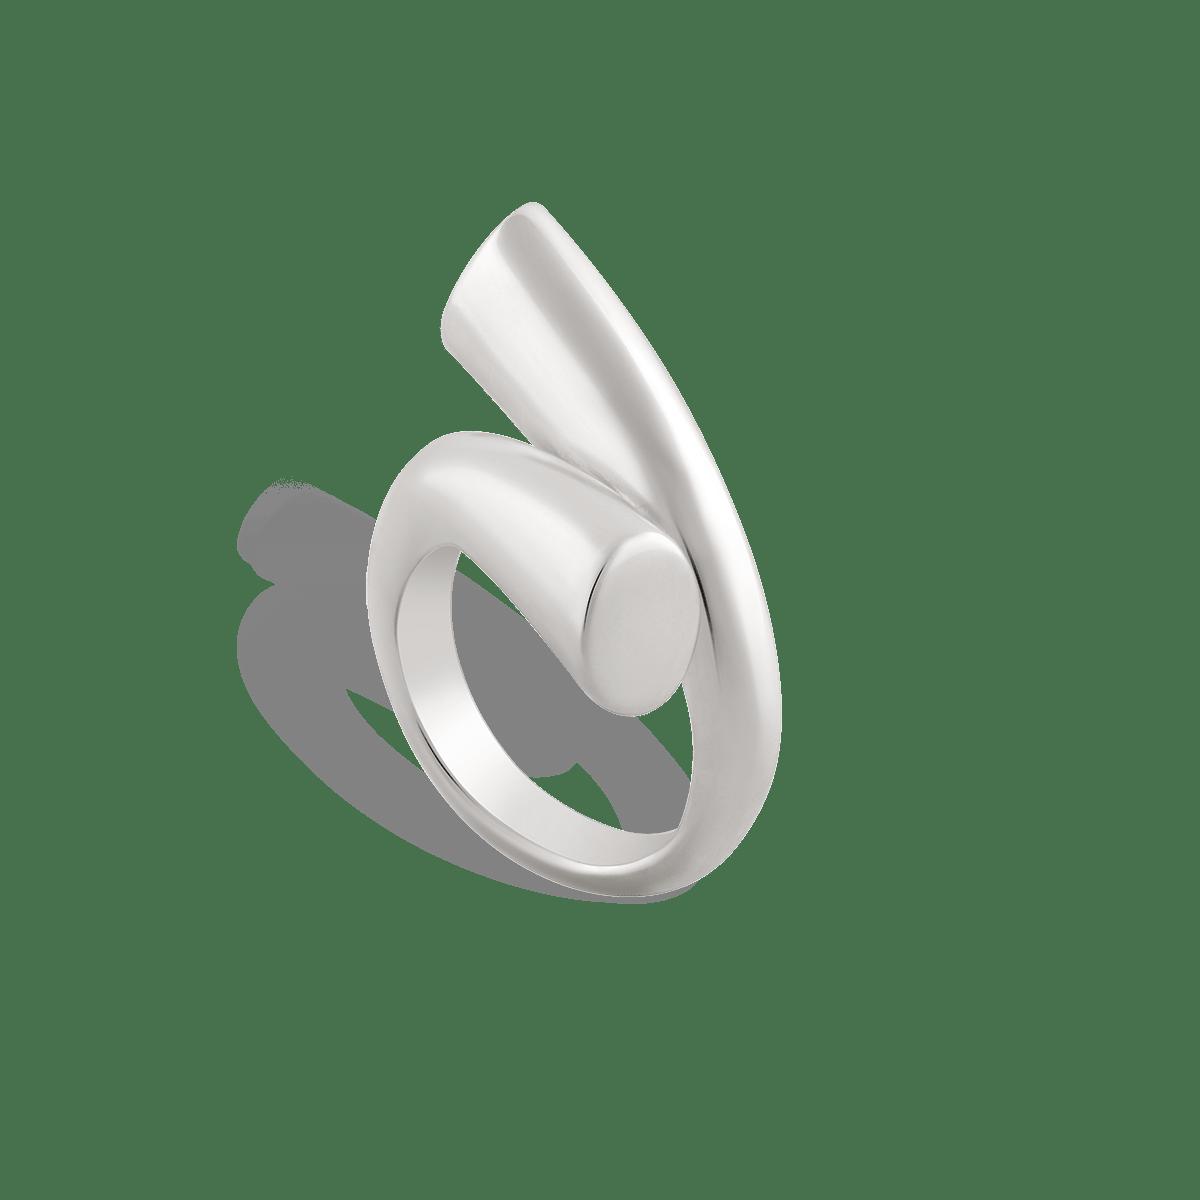 انگشتر نقره ریبن Ribbon